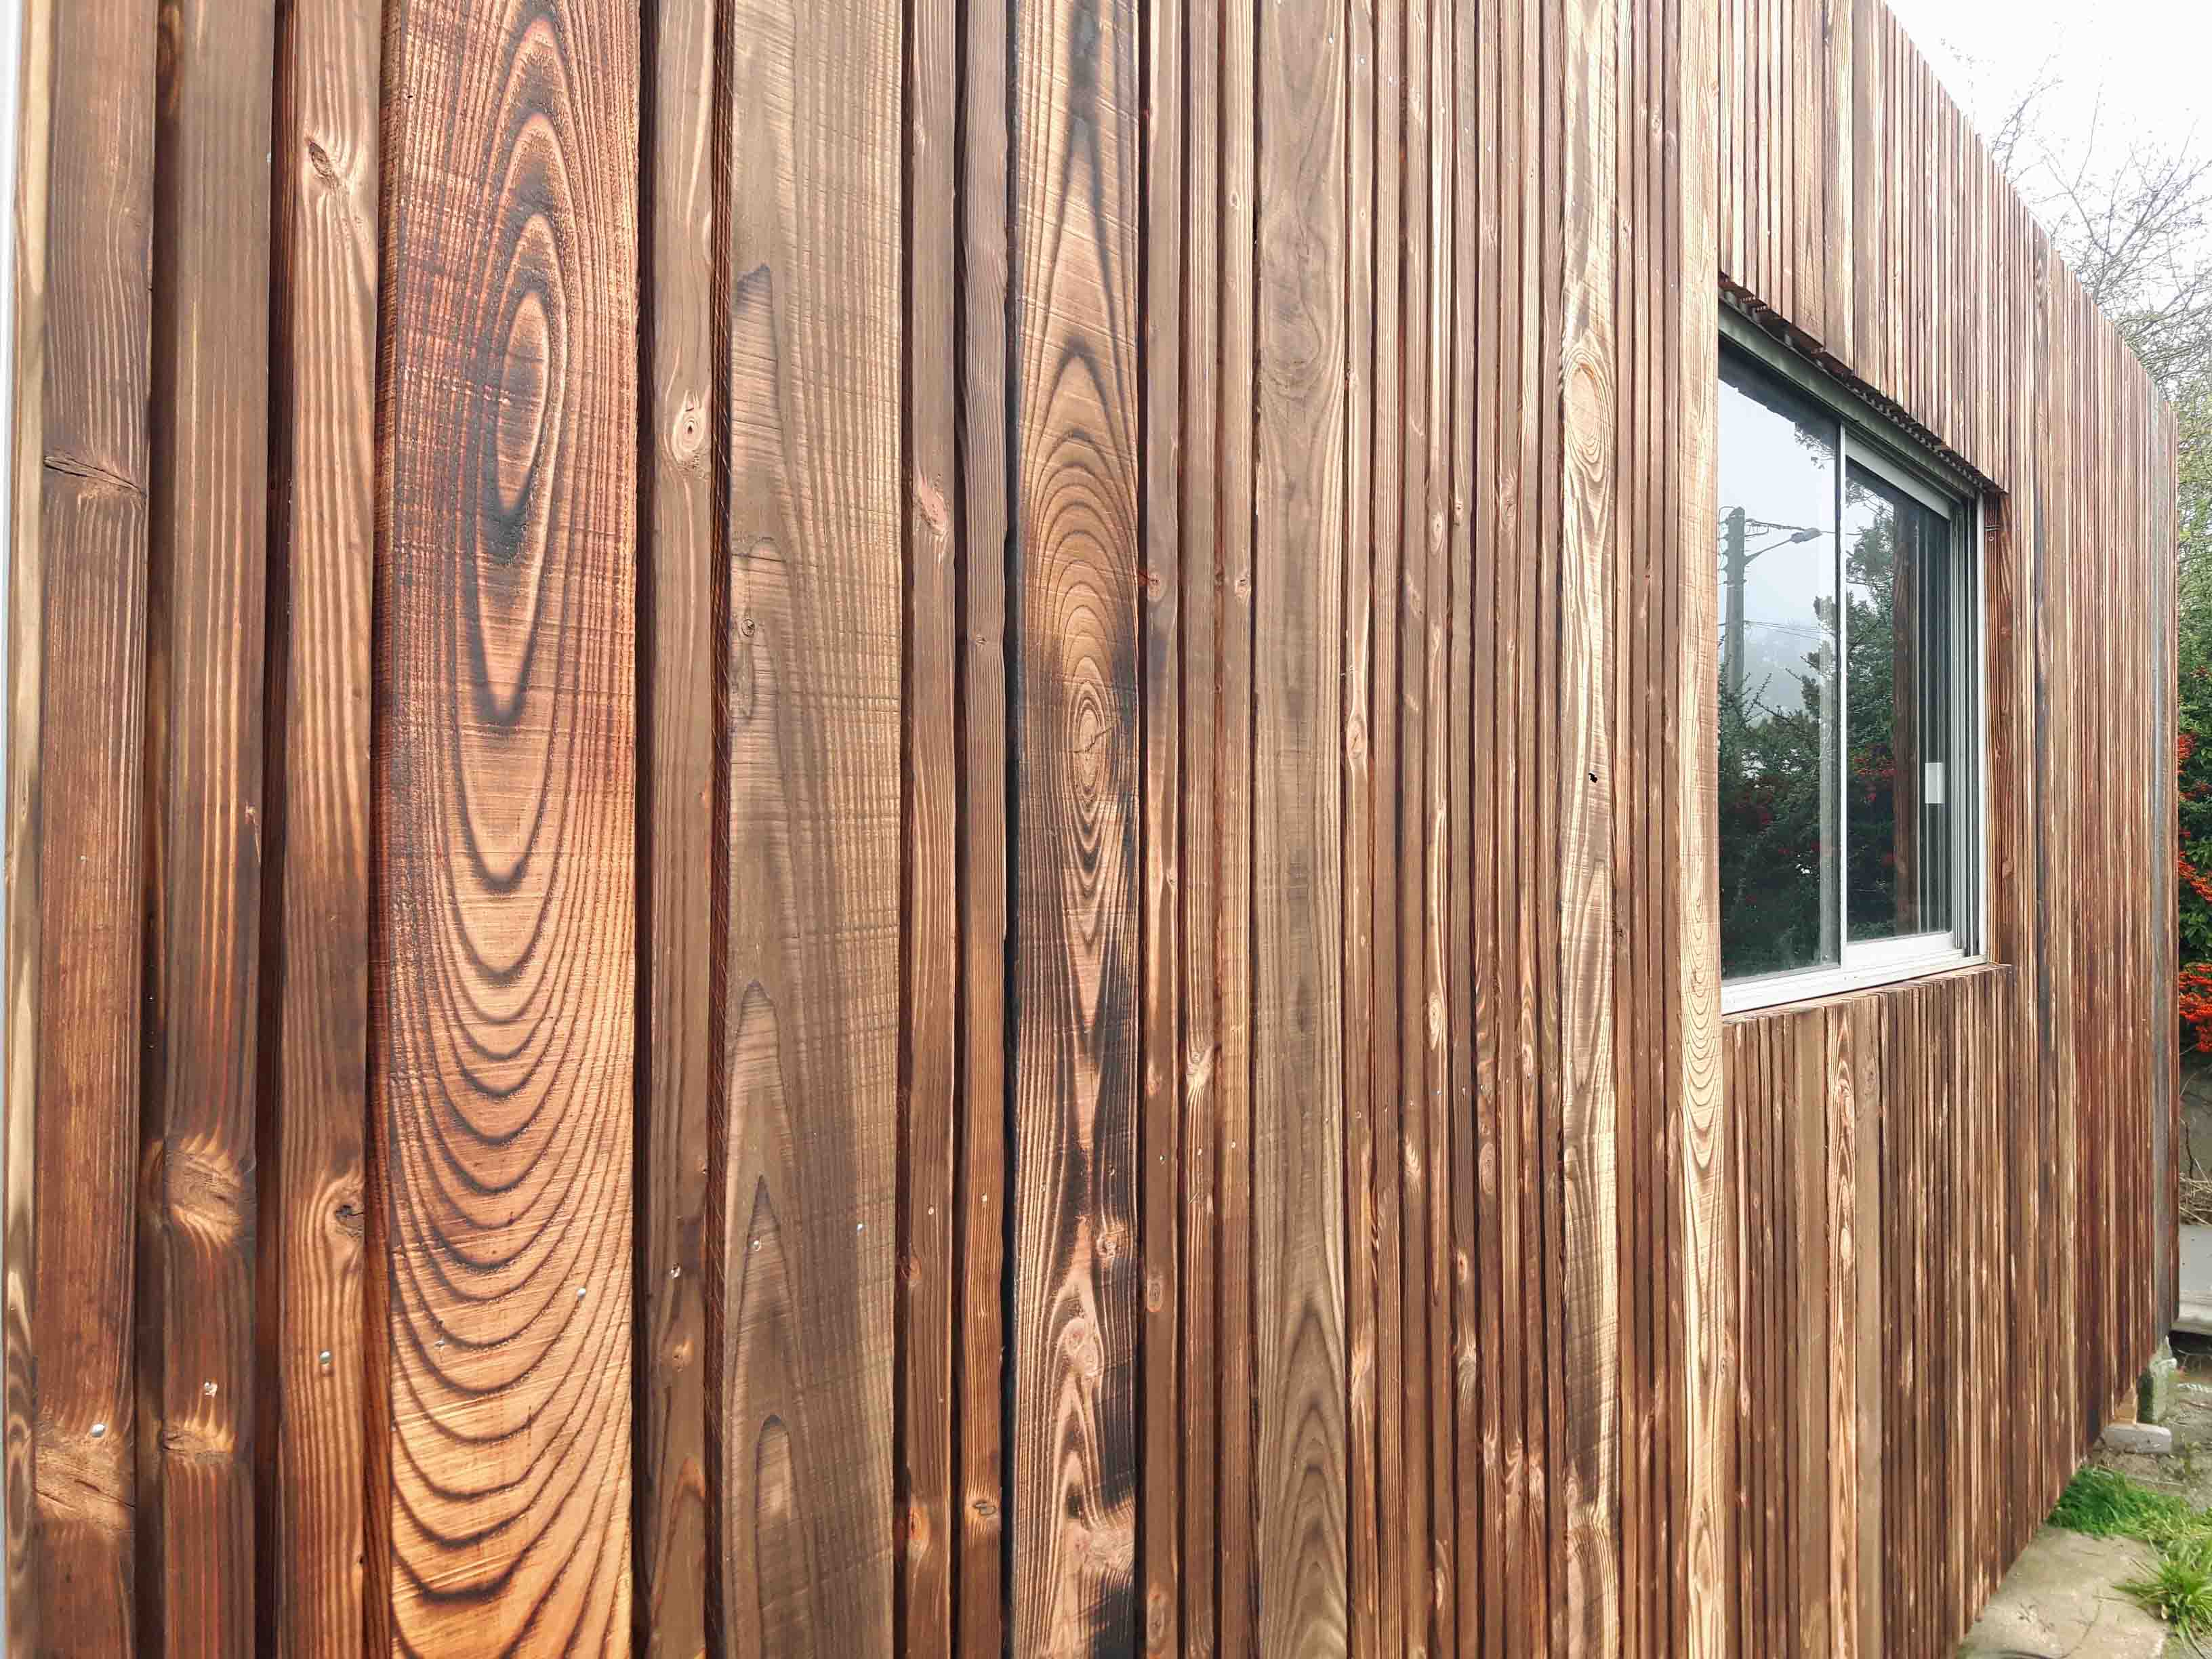 bardage d 39 un modulaire algeco tendance bardage terrasse. Black Bedroom Furniture Sets. Home Design Ideas